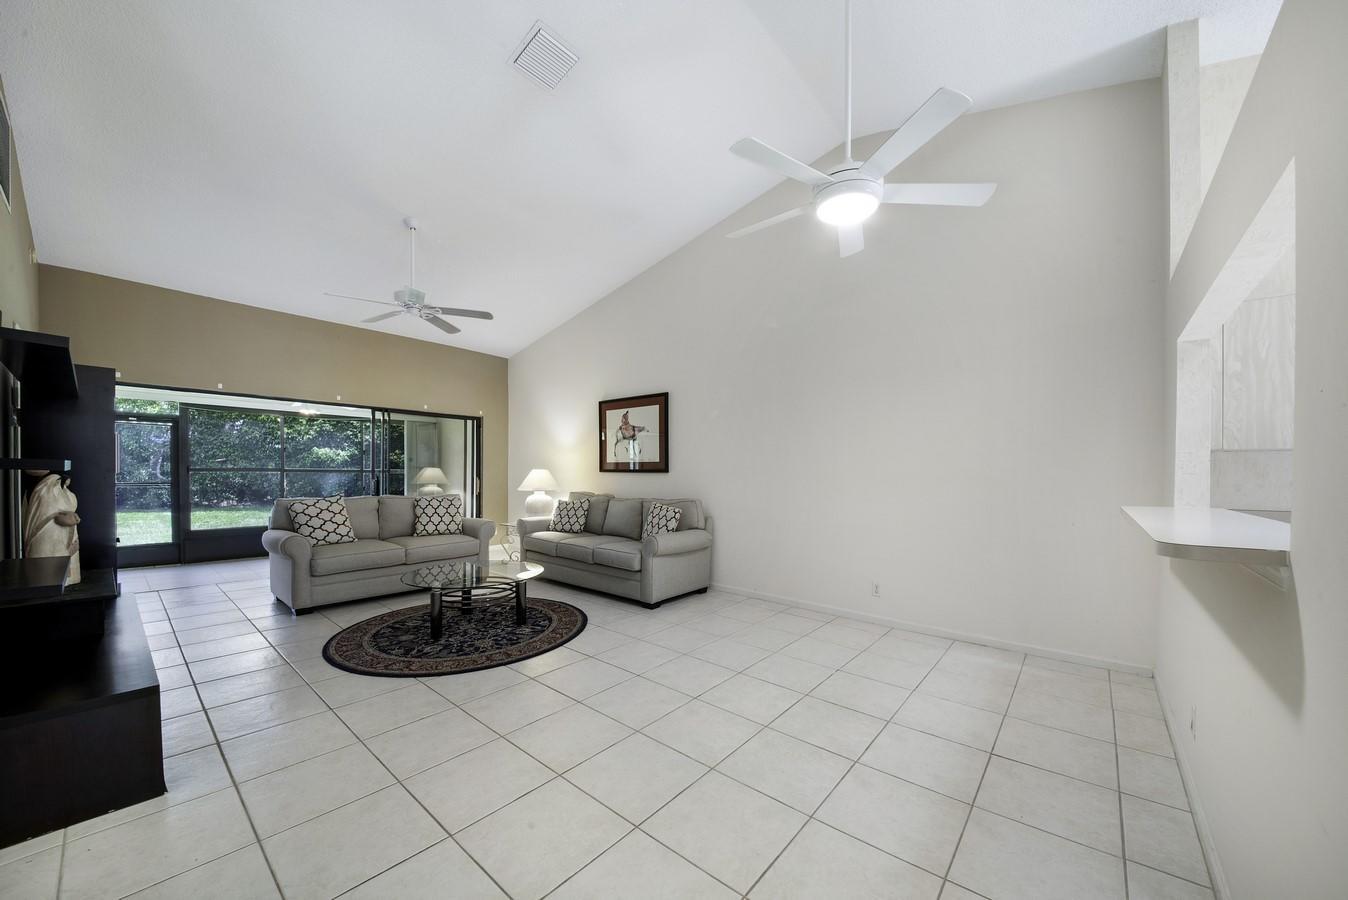 9747 Pavarotti Terrace 103 Boynton Beach, FL 33437 photo 7